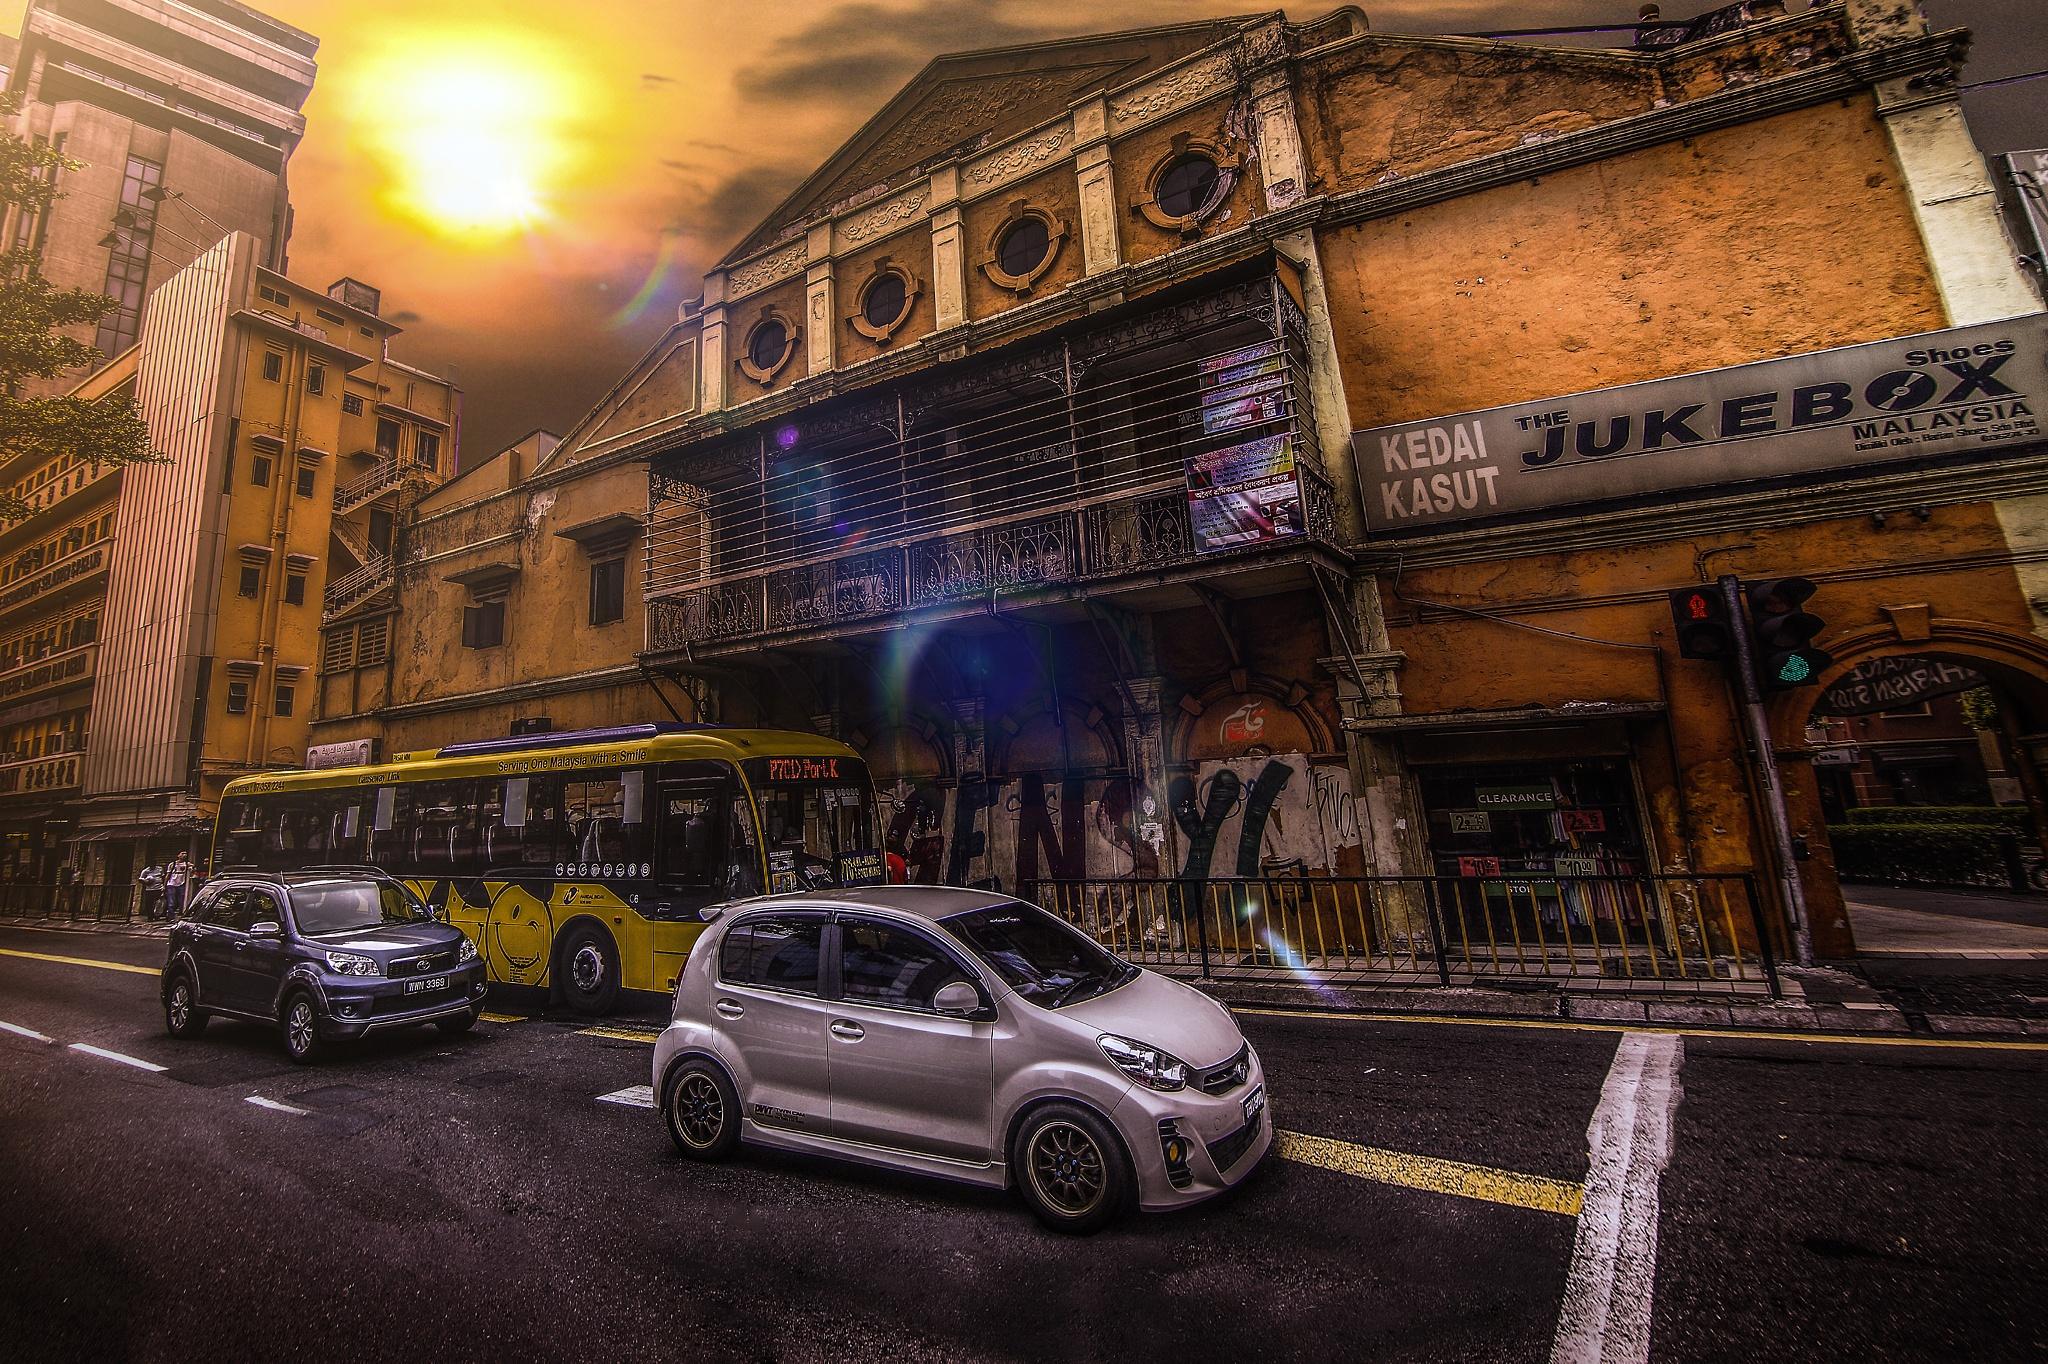 Petaling Street by Qasem El Akhdar